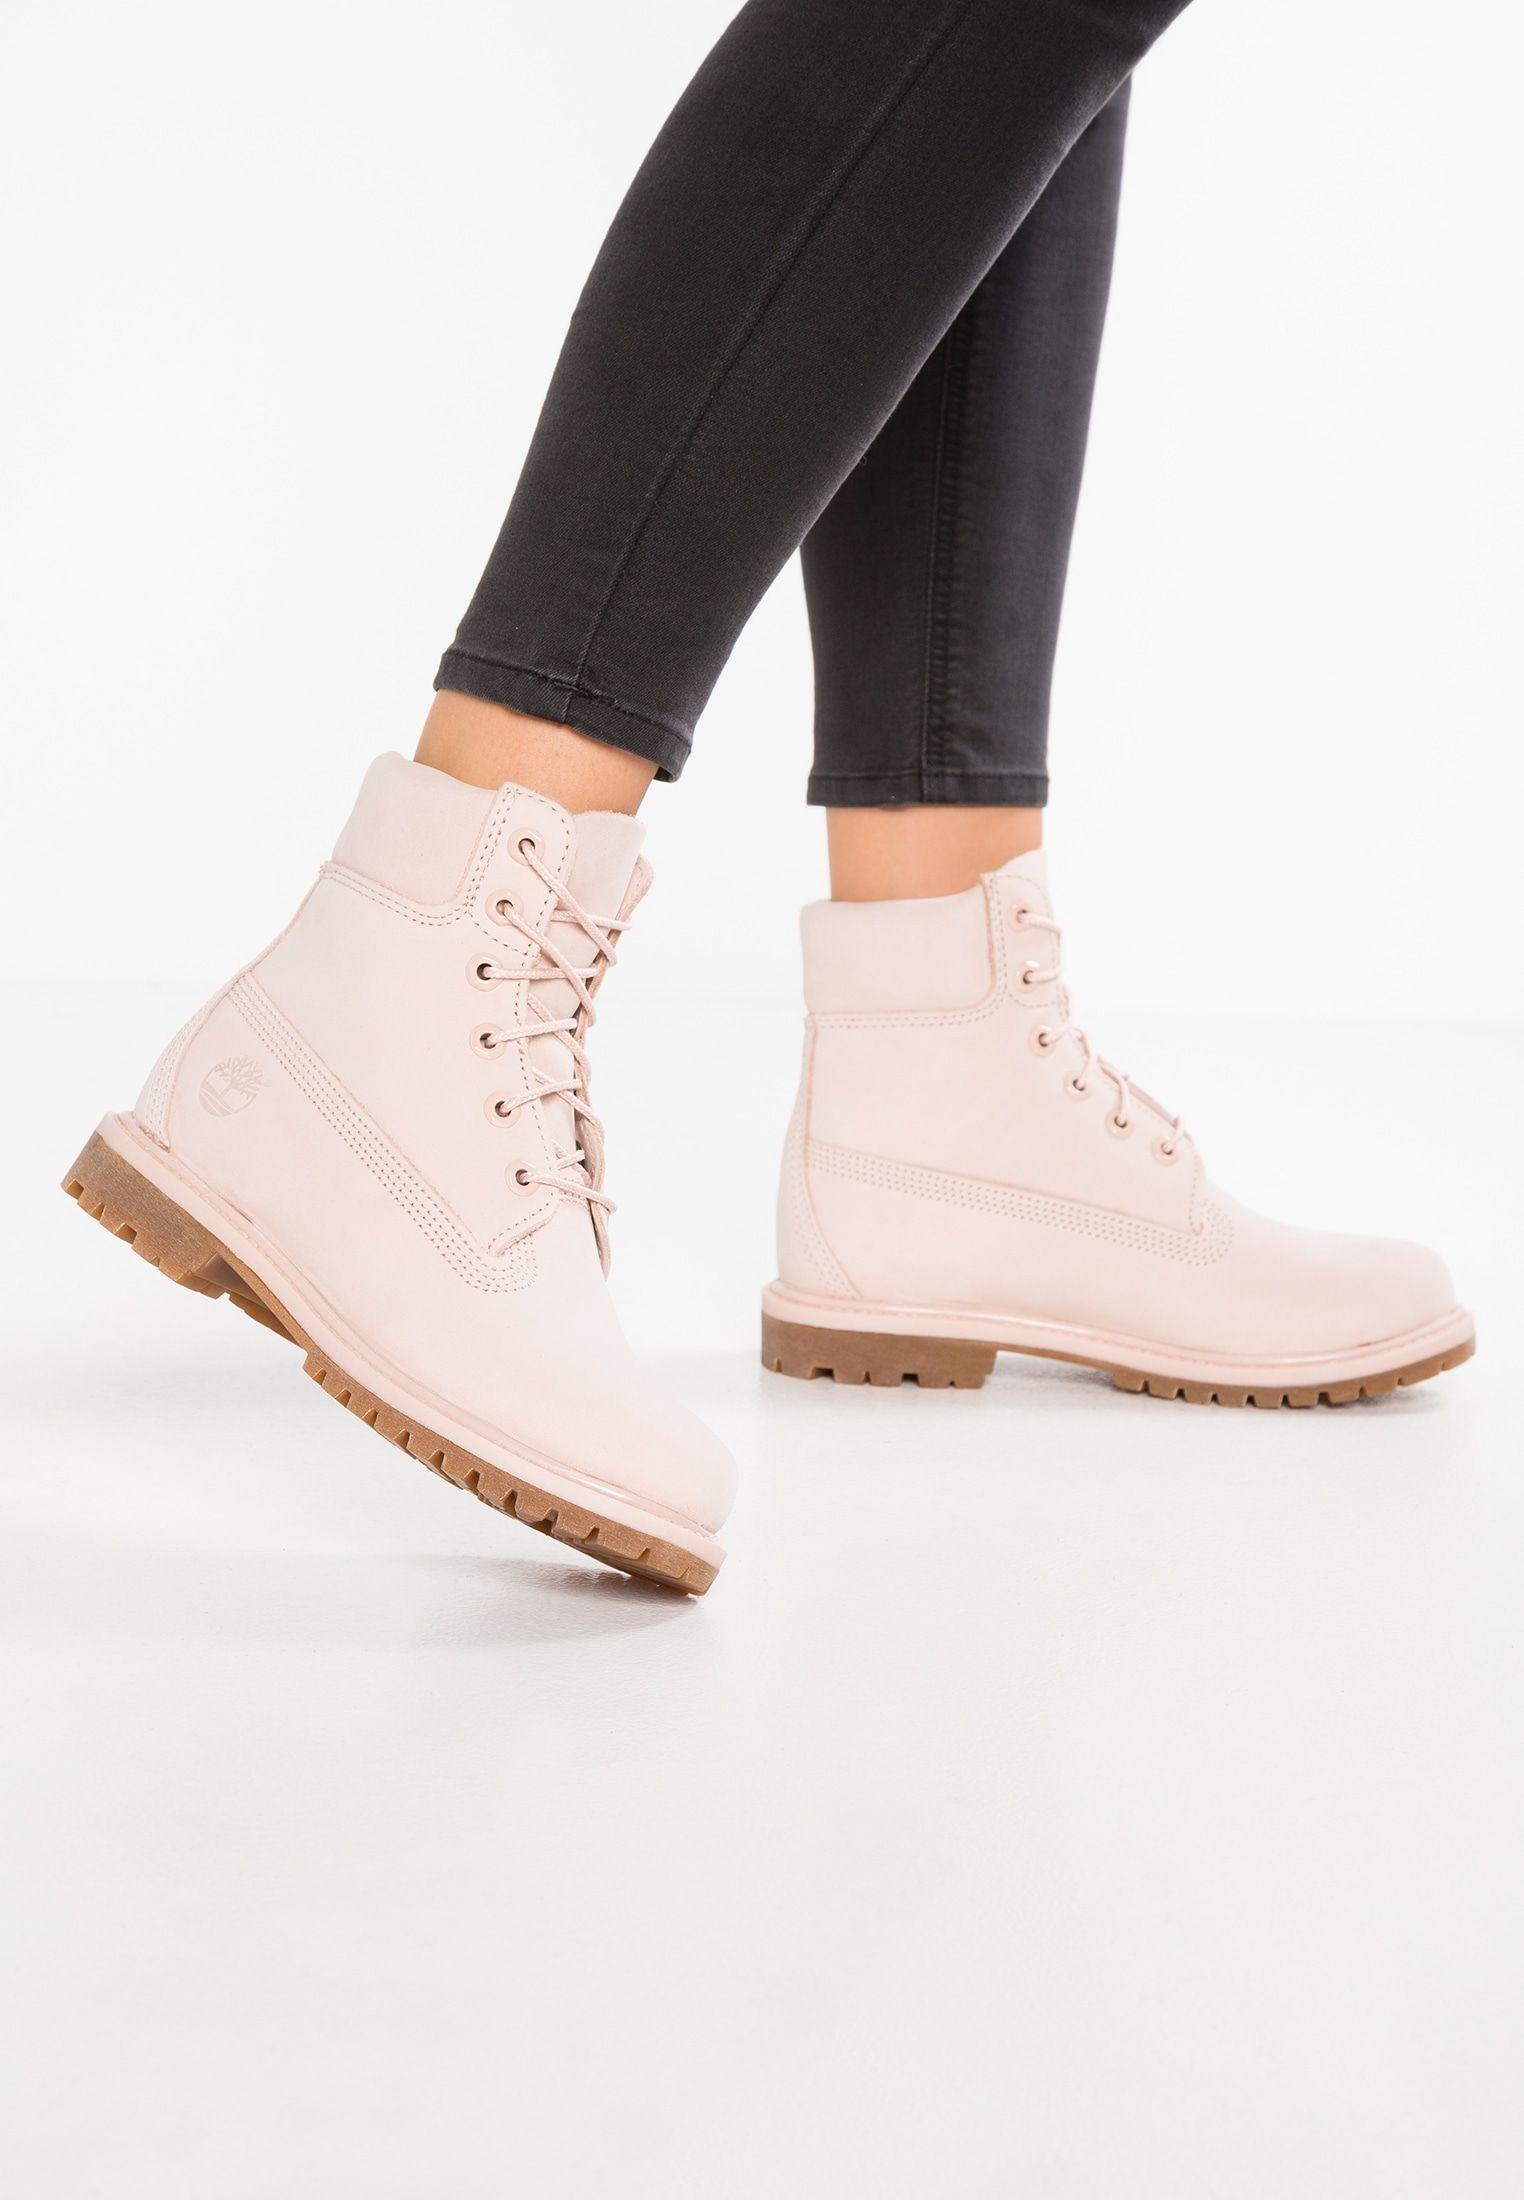 libro de texto Pensar en el futuro basura  Timberland 6INCH PREMIUM - Lace-up boots - rose - Zalando.co.uk | Timberland  boots, Boots, Lace up ankle boots